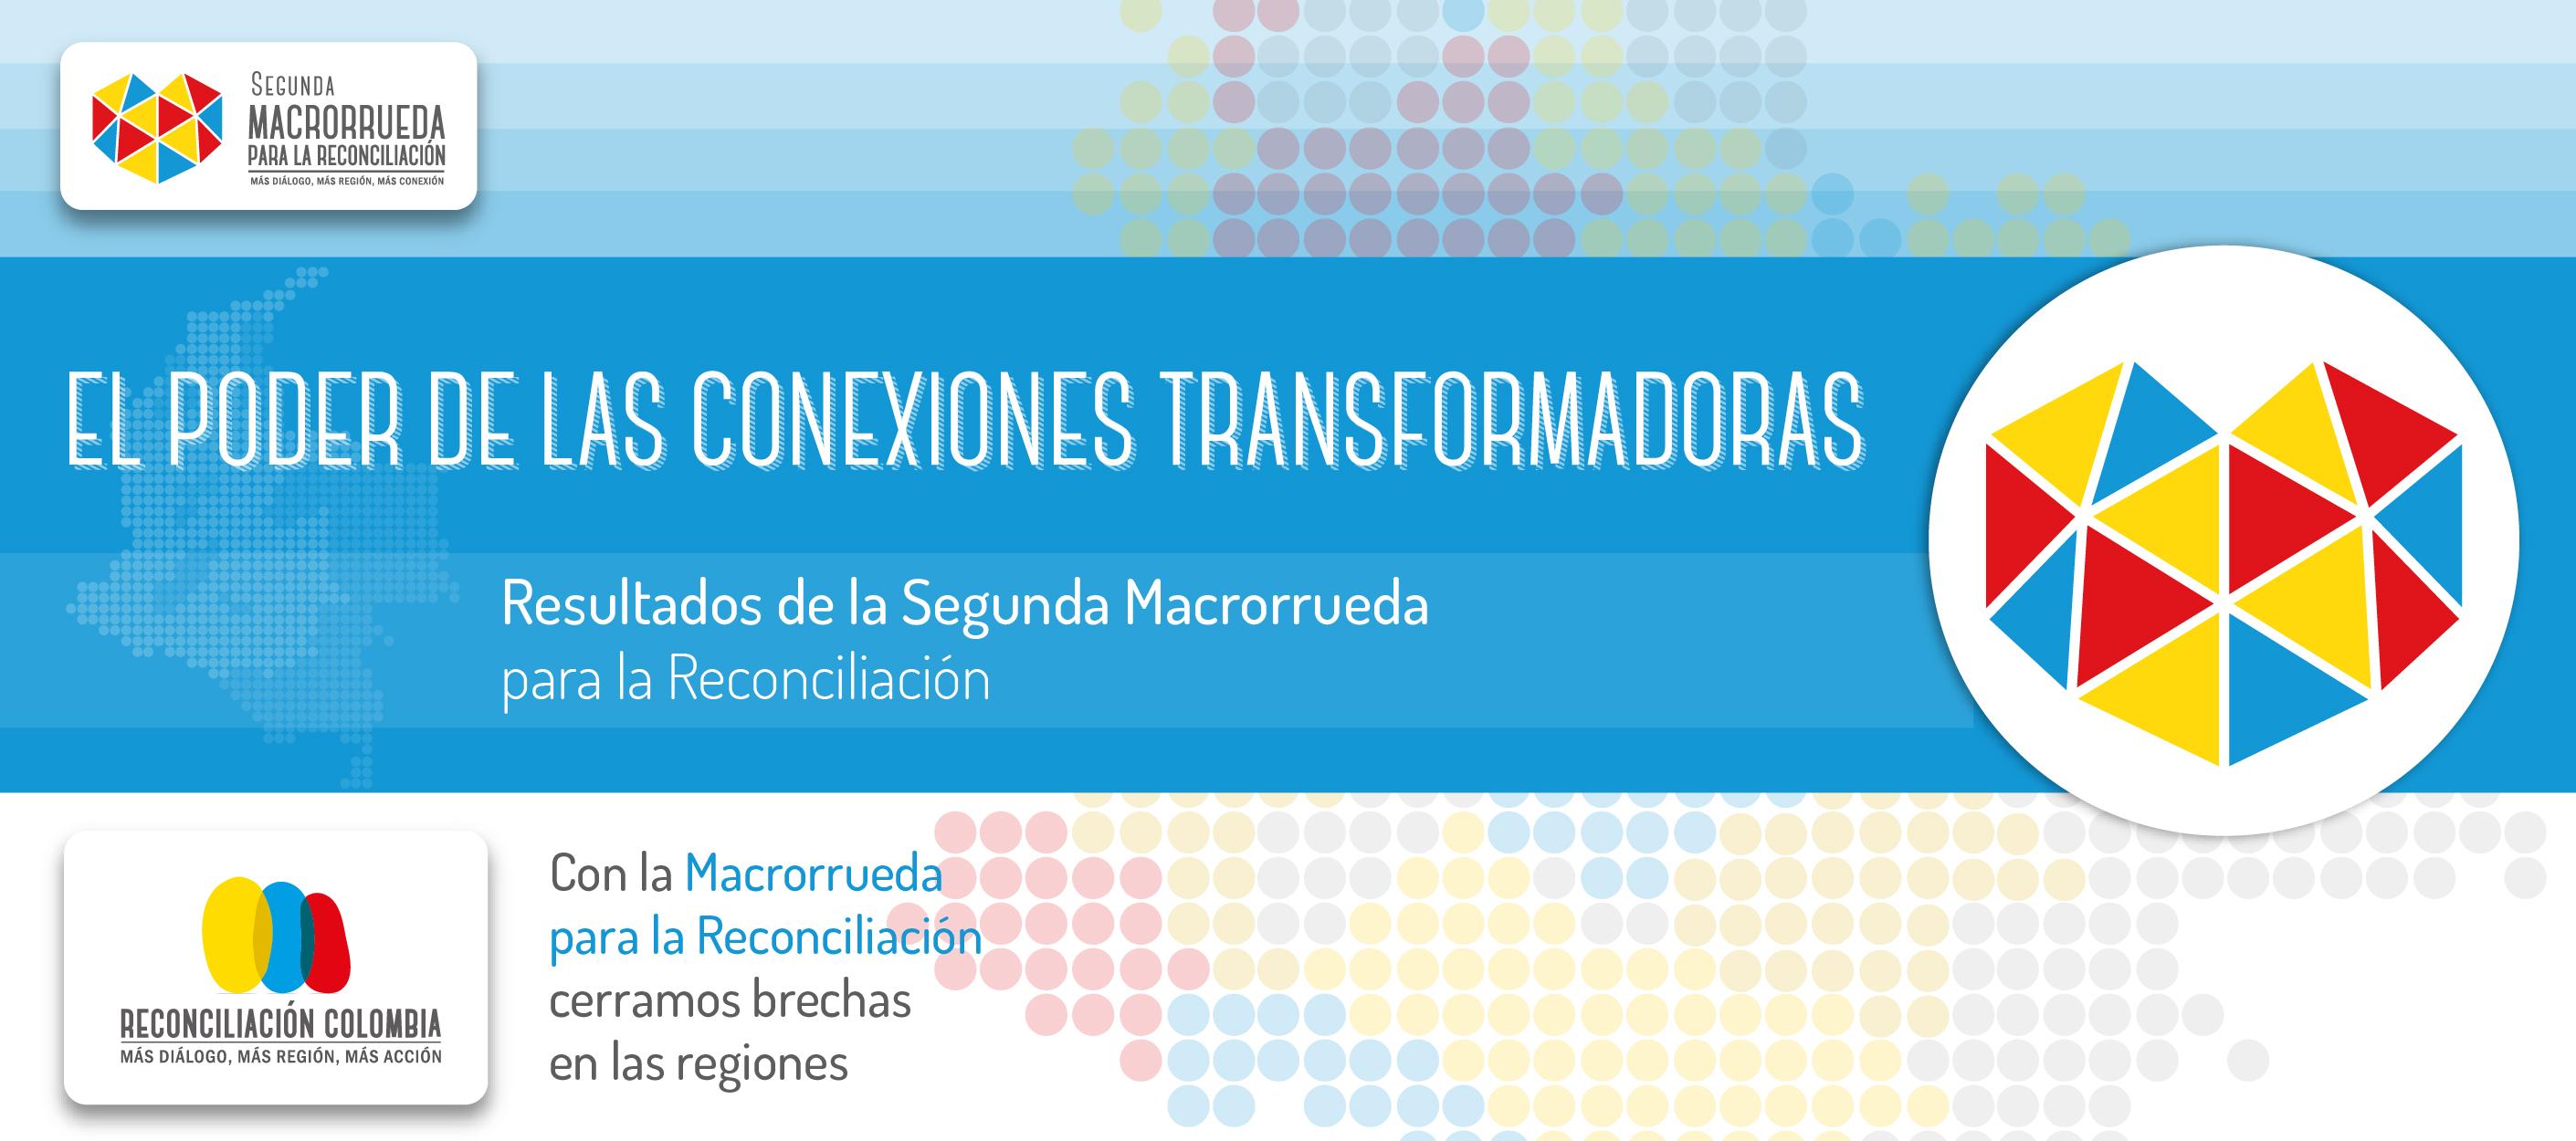 http://s3.amazonaws.com/macrorrueda2017/banner/1513873085.Banner_%28Resultados_2MR%29%28A%29-01.jpg